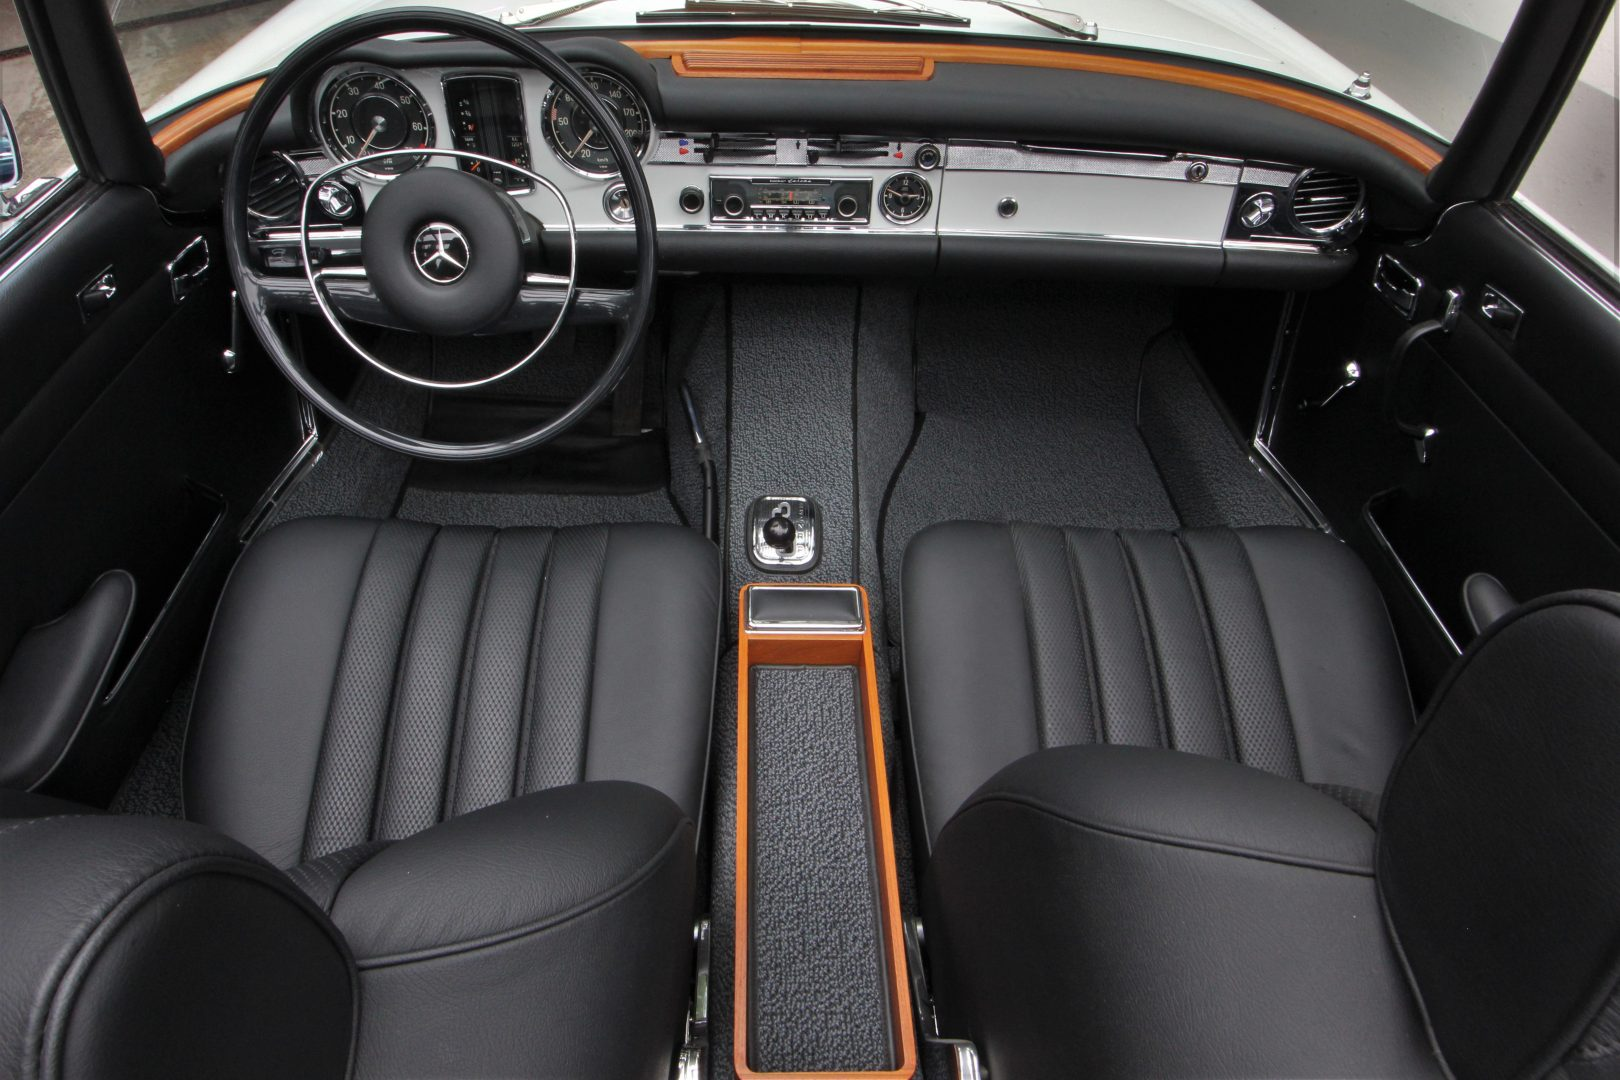 AIL Mercedes-Benz 280 SL Pagode Automatik 11